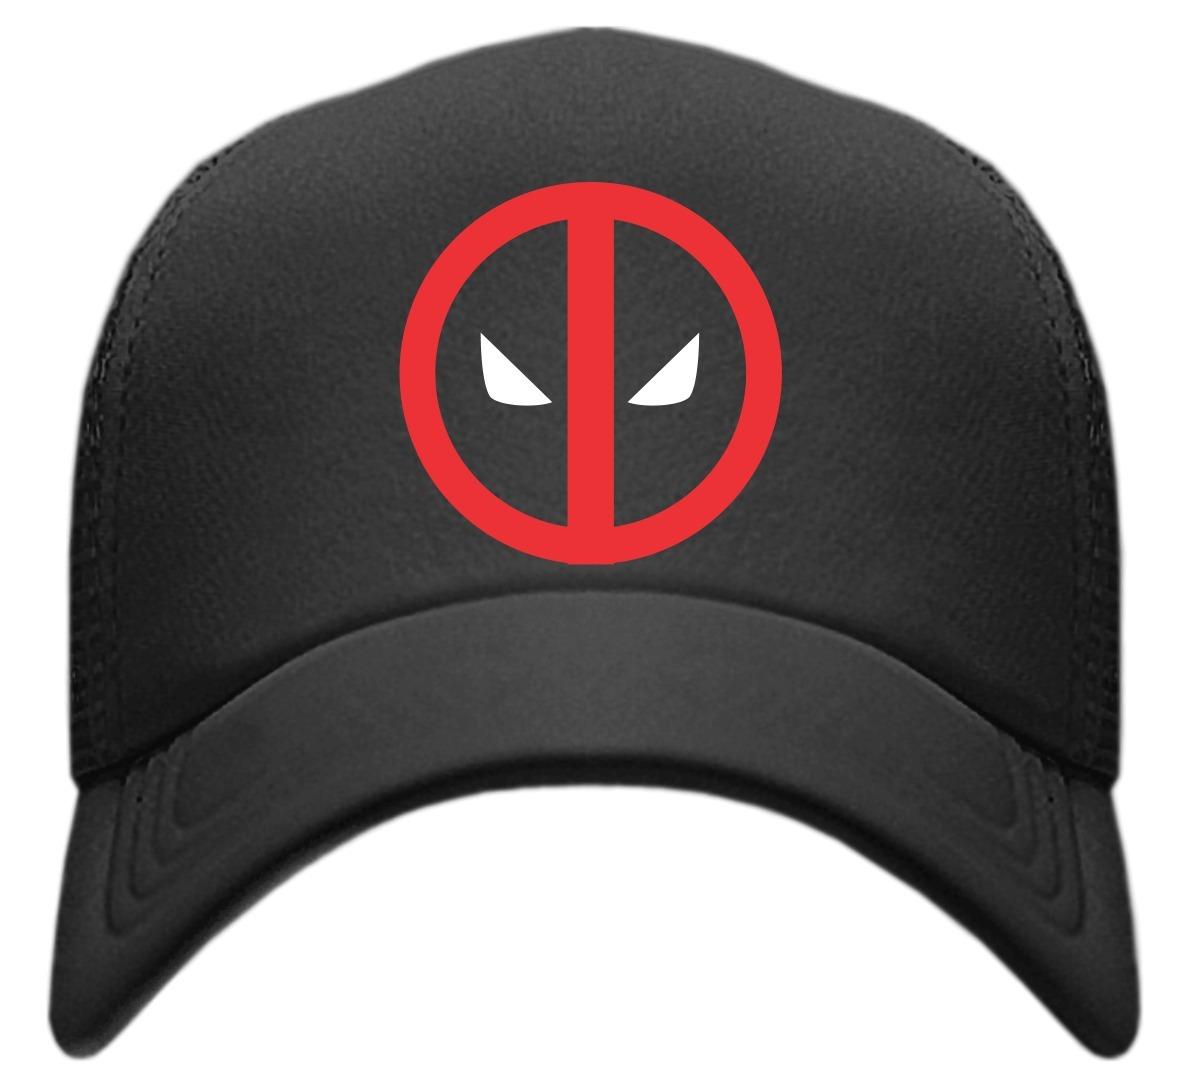 7a641b8adca33 Gorra Deadpool Pool Marvel 1 Adulto -   100.00 en Mercado Libre